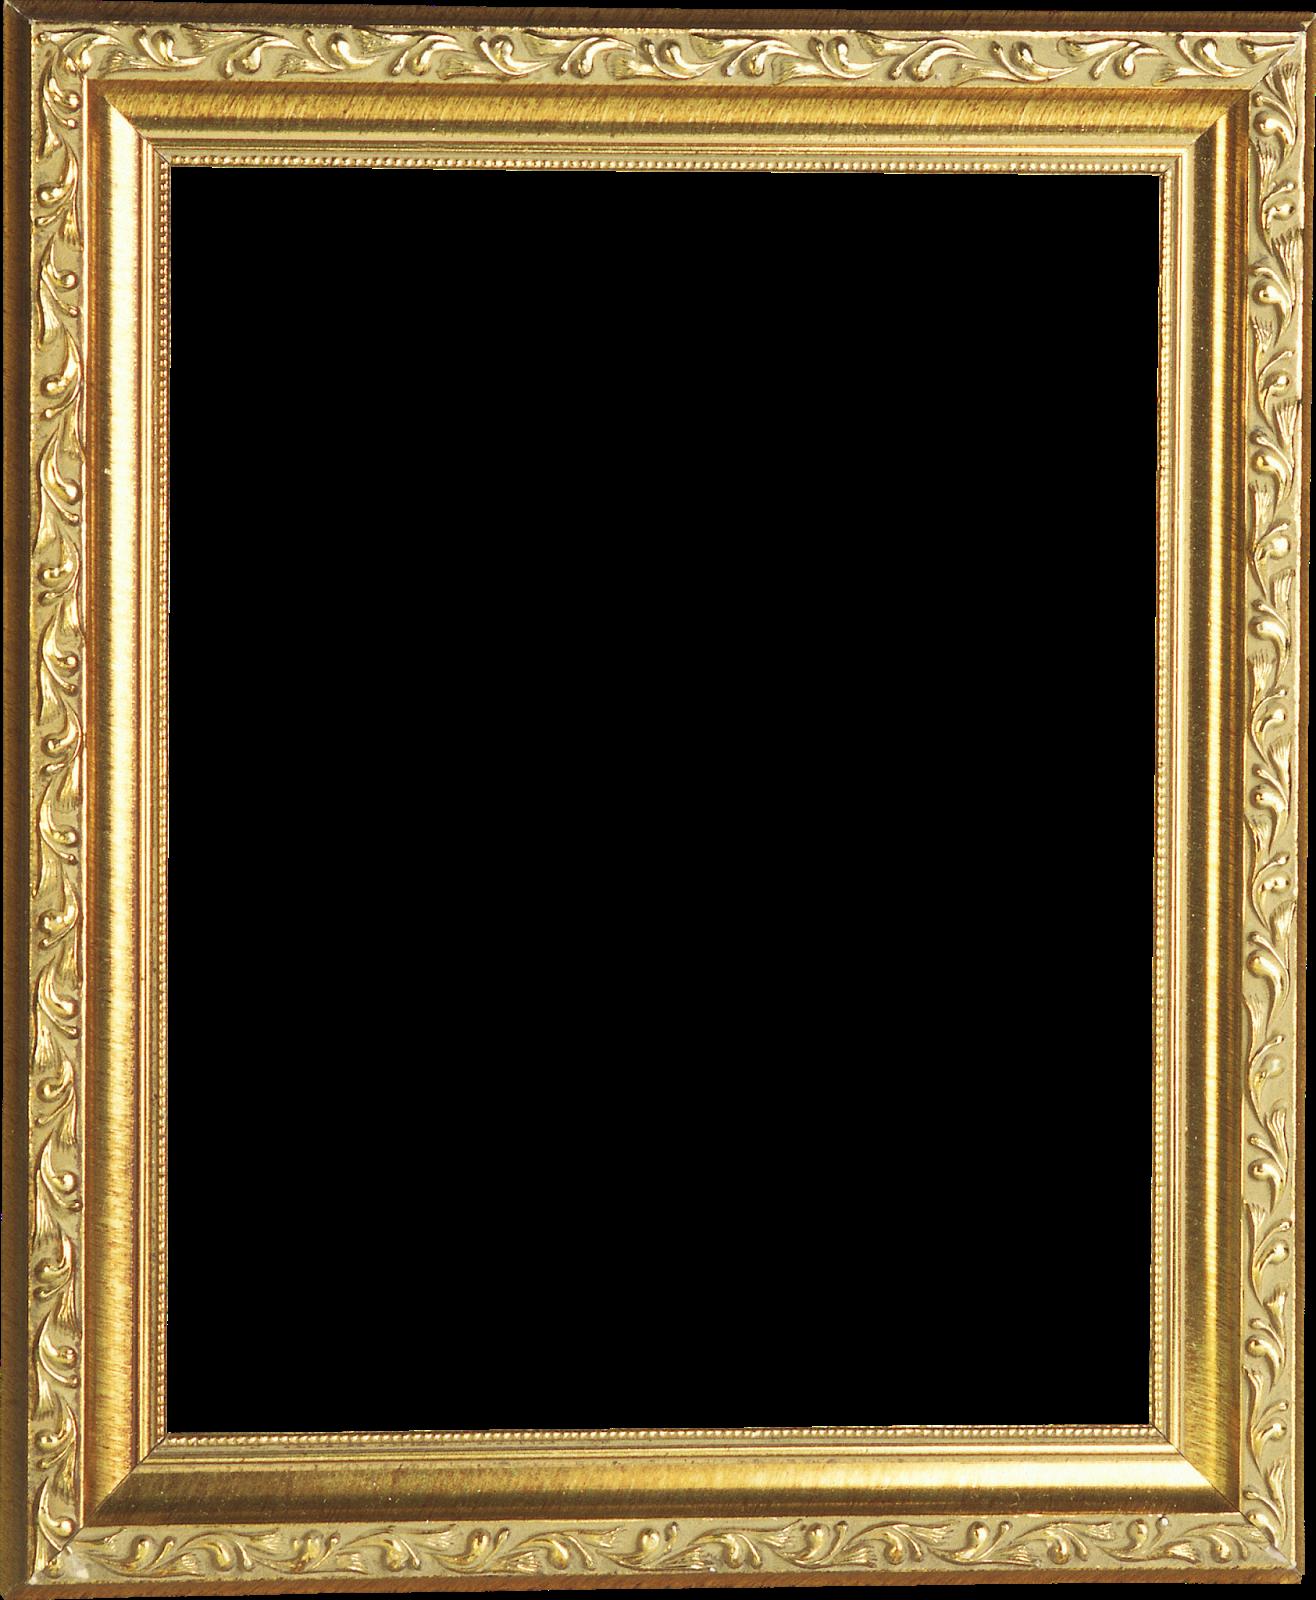 Marcos antiguos para pinturas imagui - Marco 4 fotos ...